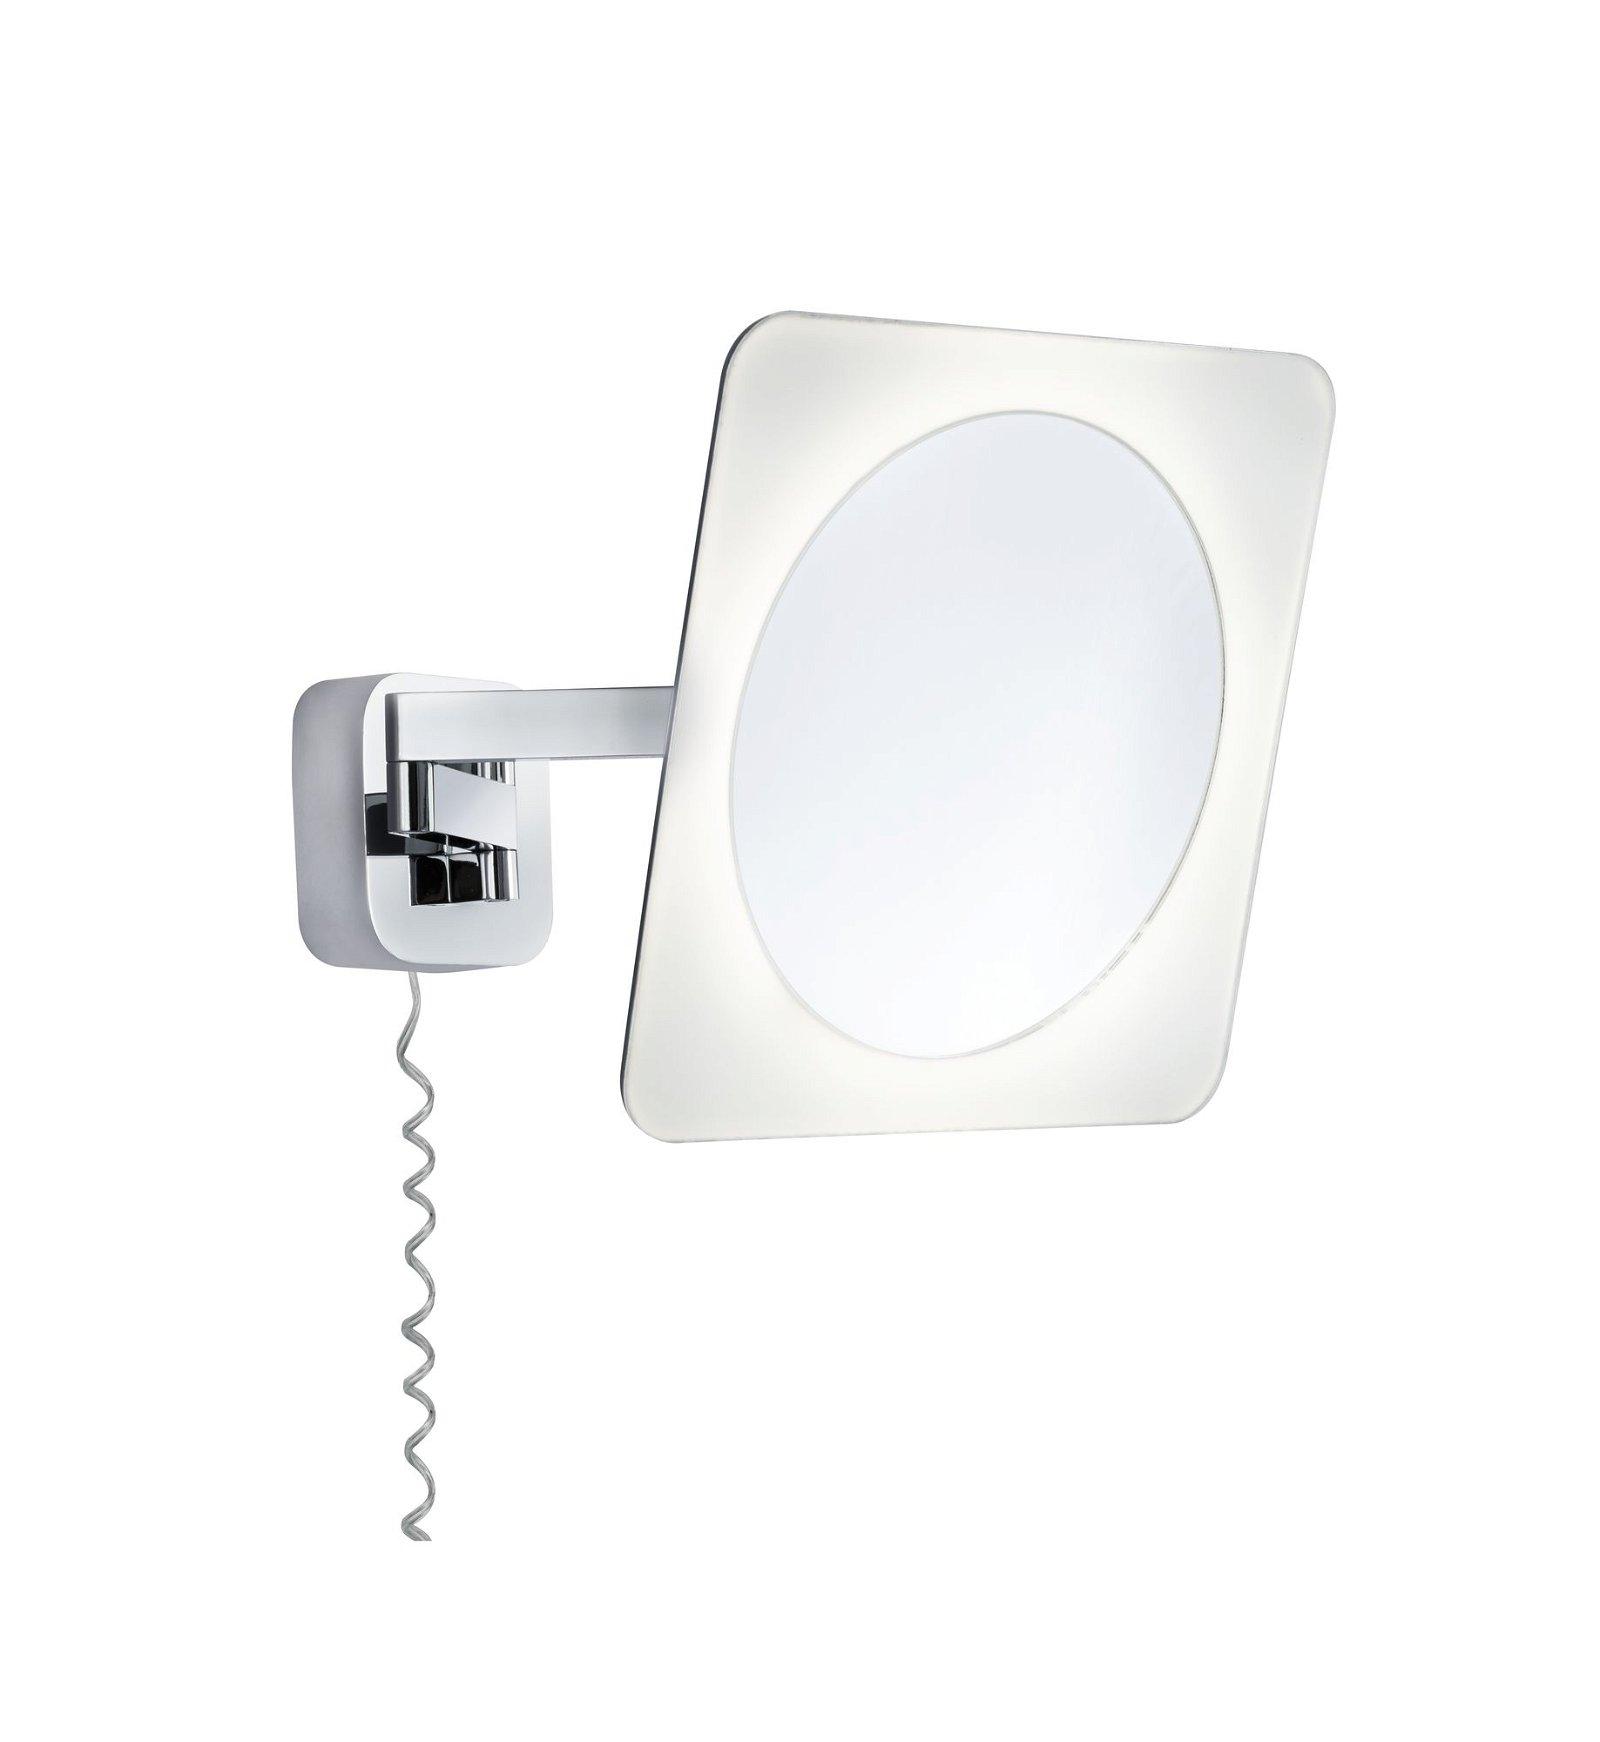 LED Kosmetikspiegel Bela Mit Leuchtmittel IP44 3000K 260lm 230V 5,7W Chrom/Weiß/Spiegel